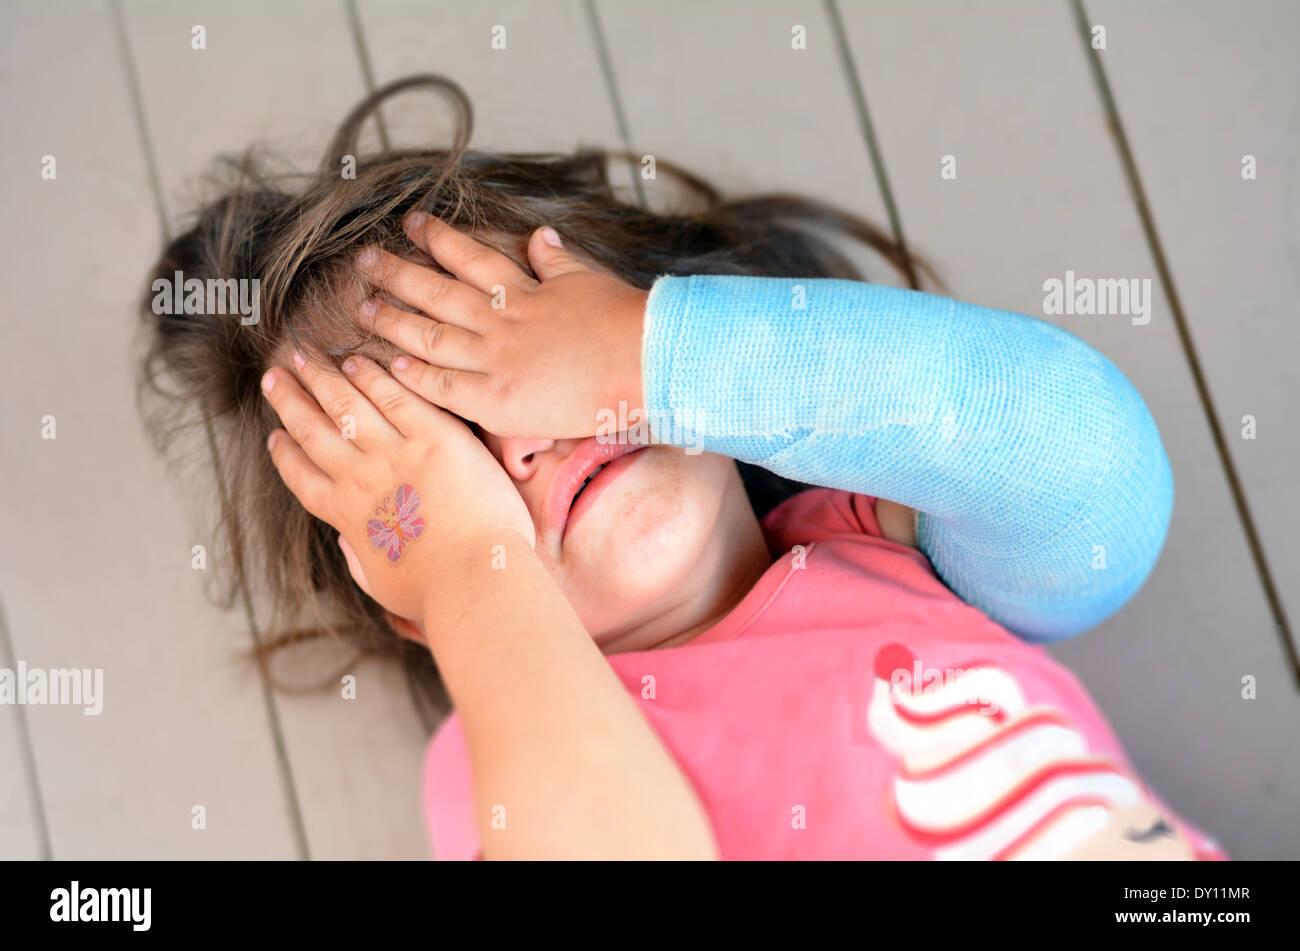 Abusó de niña con un brazo roto cubriendo aquí cara mientras llora. Concepto foto de abuso infantil, Imagen De Stock